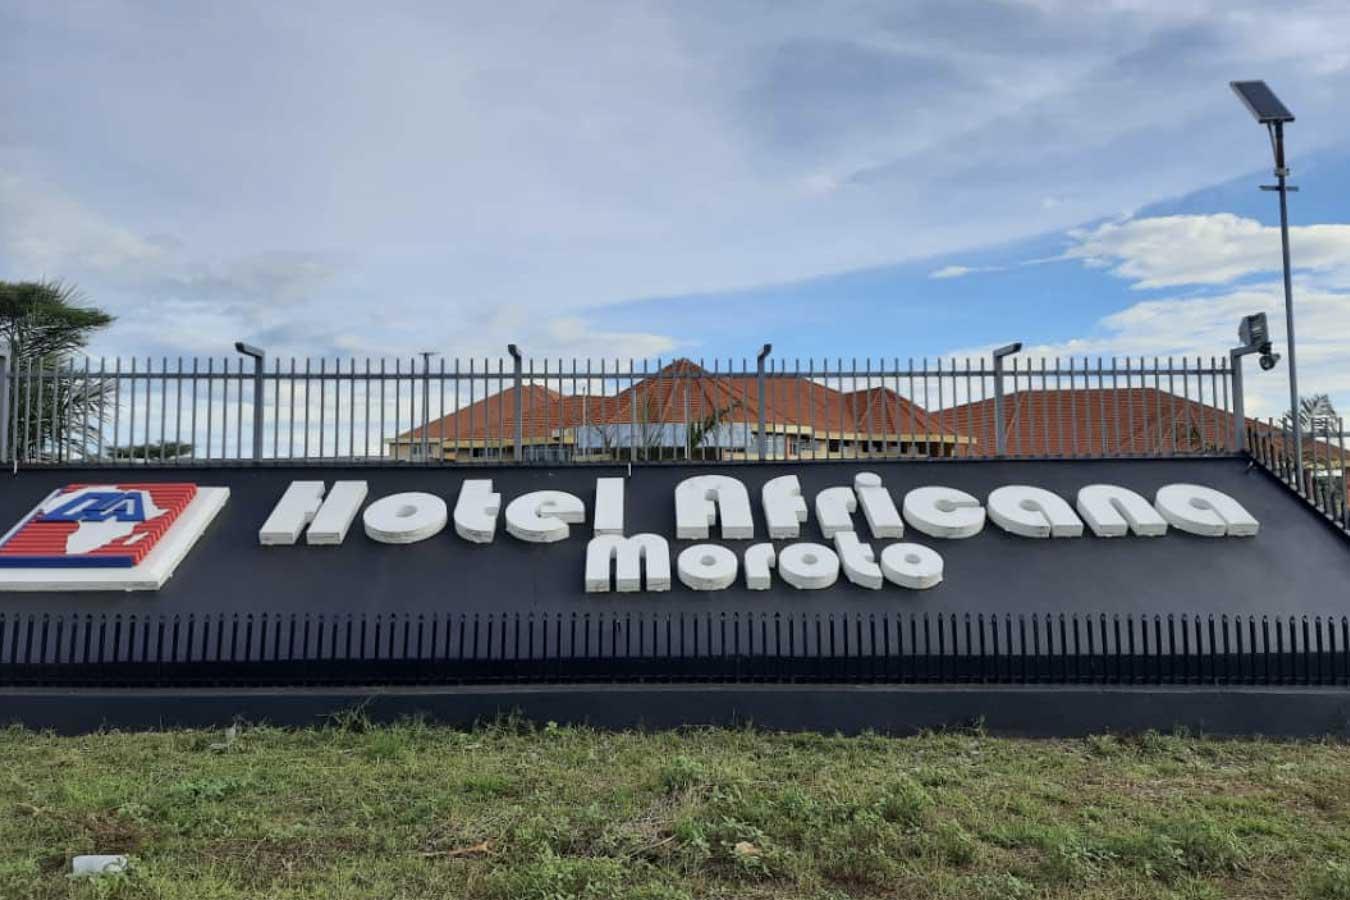 kara-tunga-karamoja-tourism-academy-school-hotel-africana-moroto-2